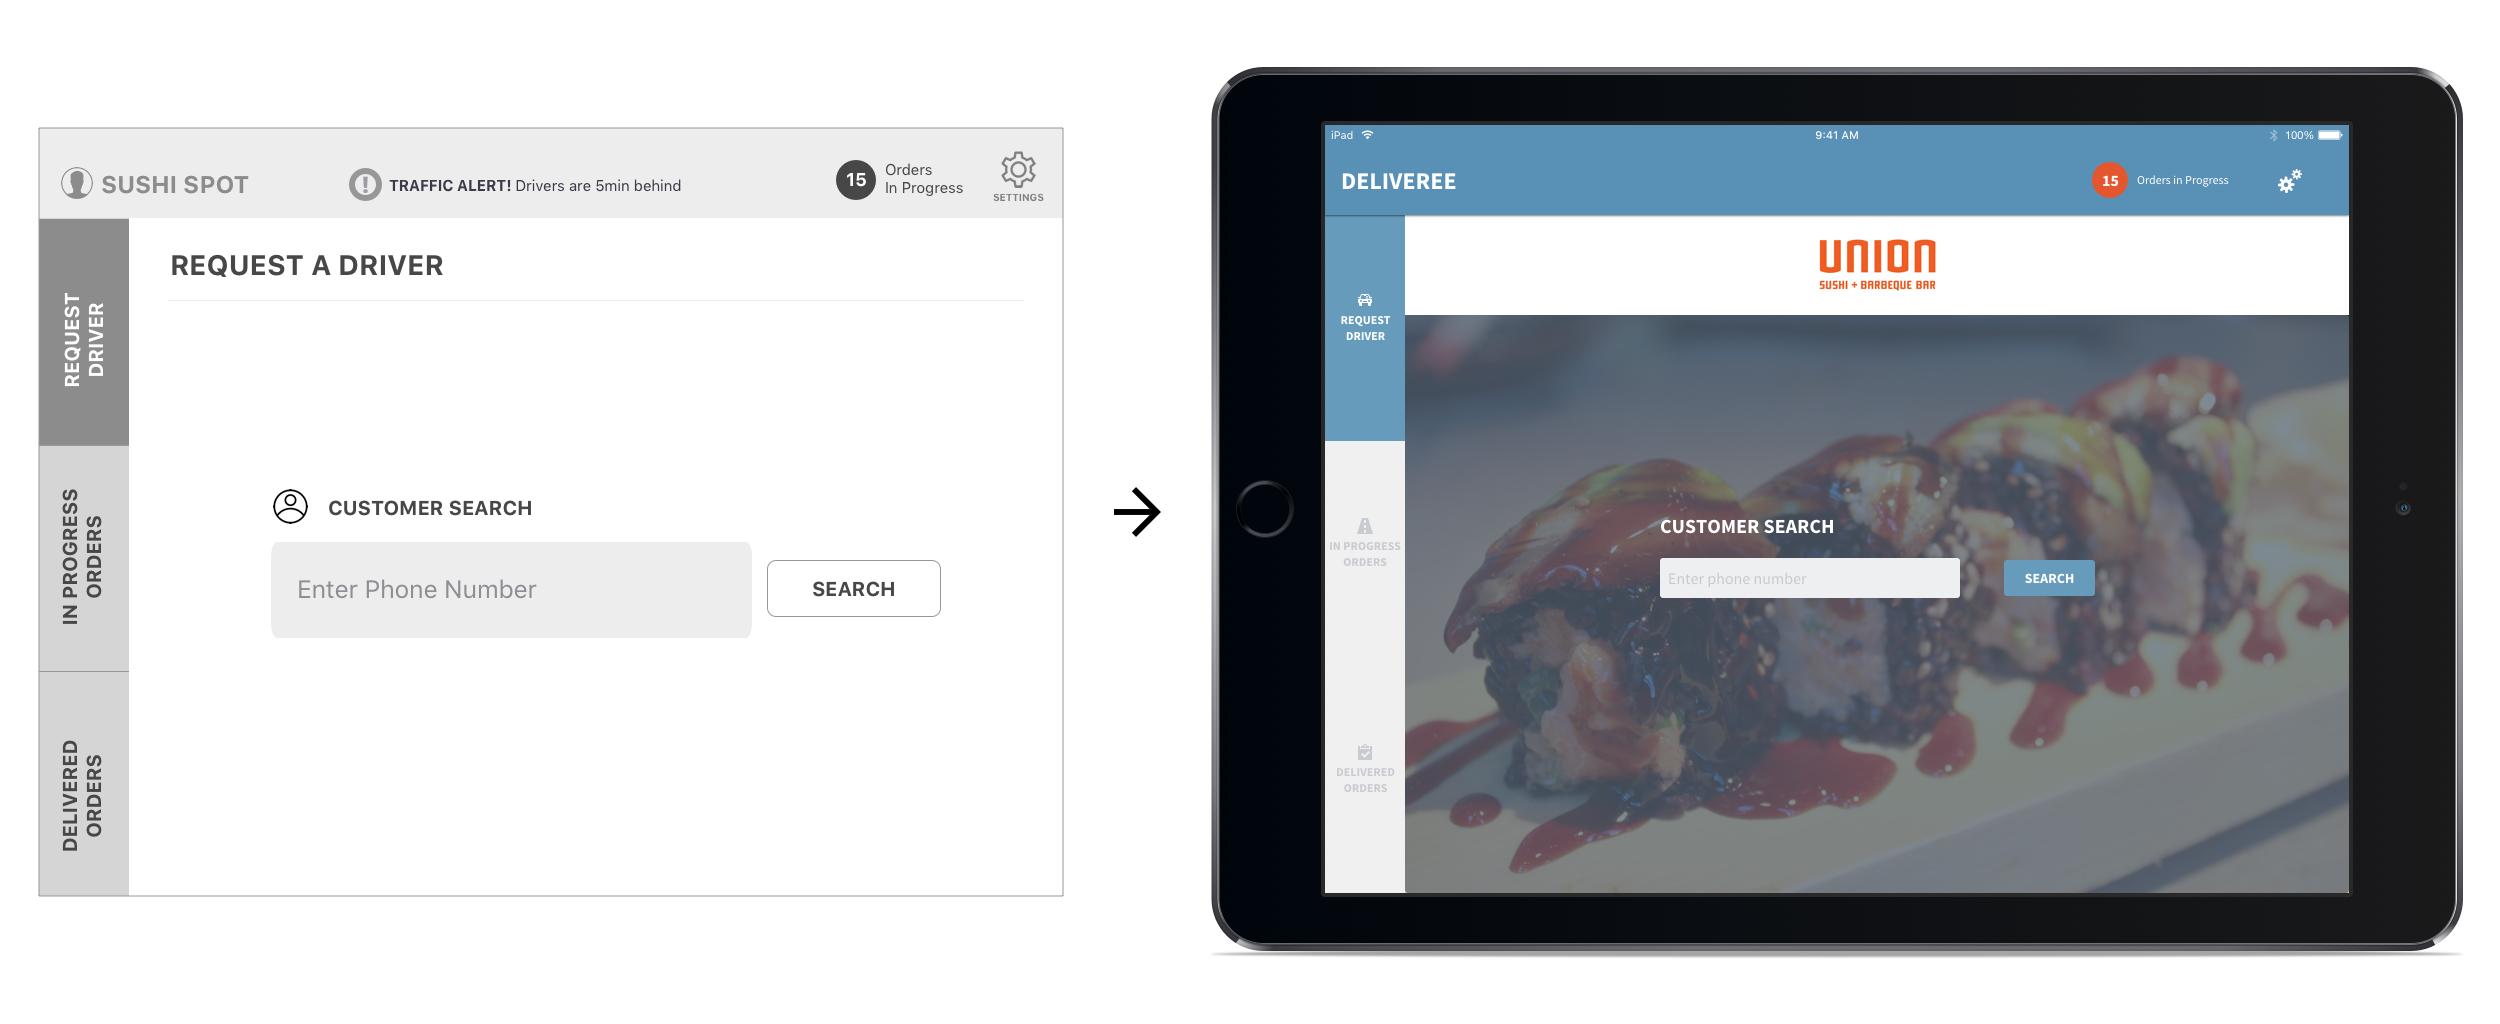 Customer Search - 1st Pass .jpg